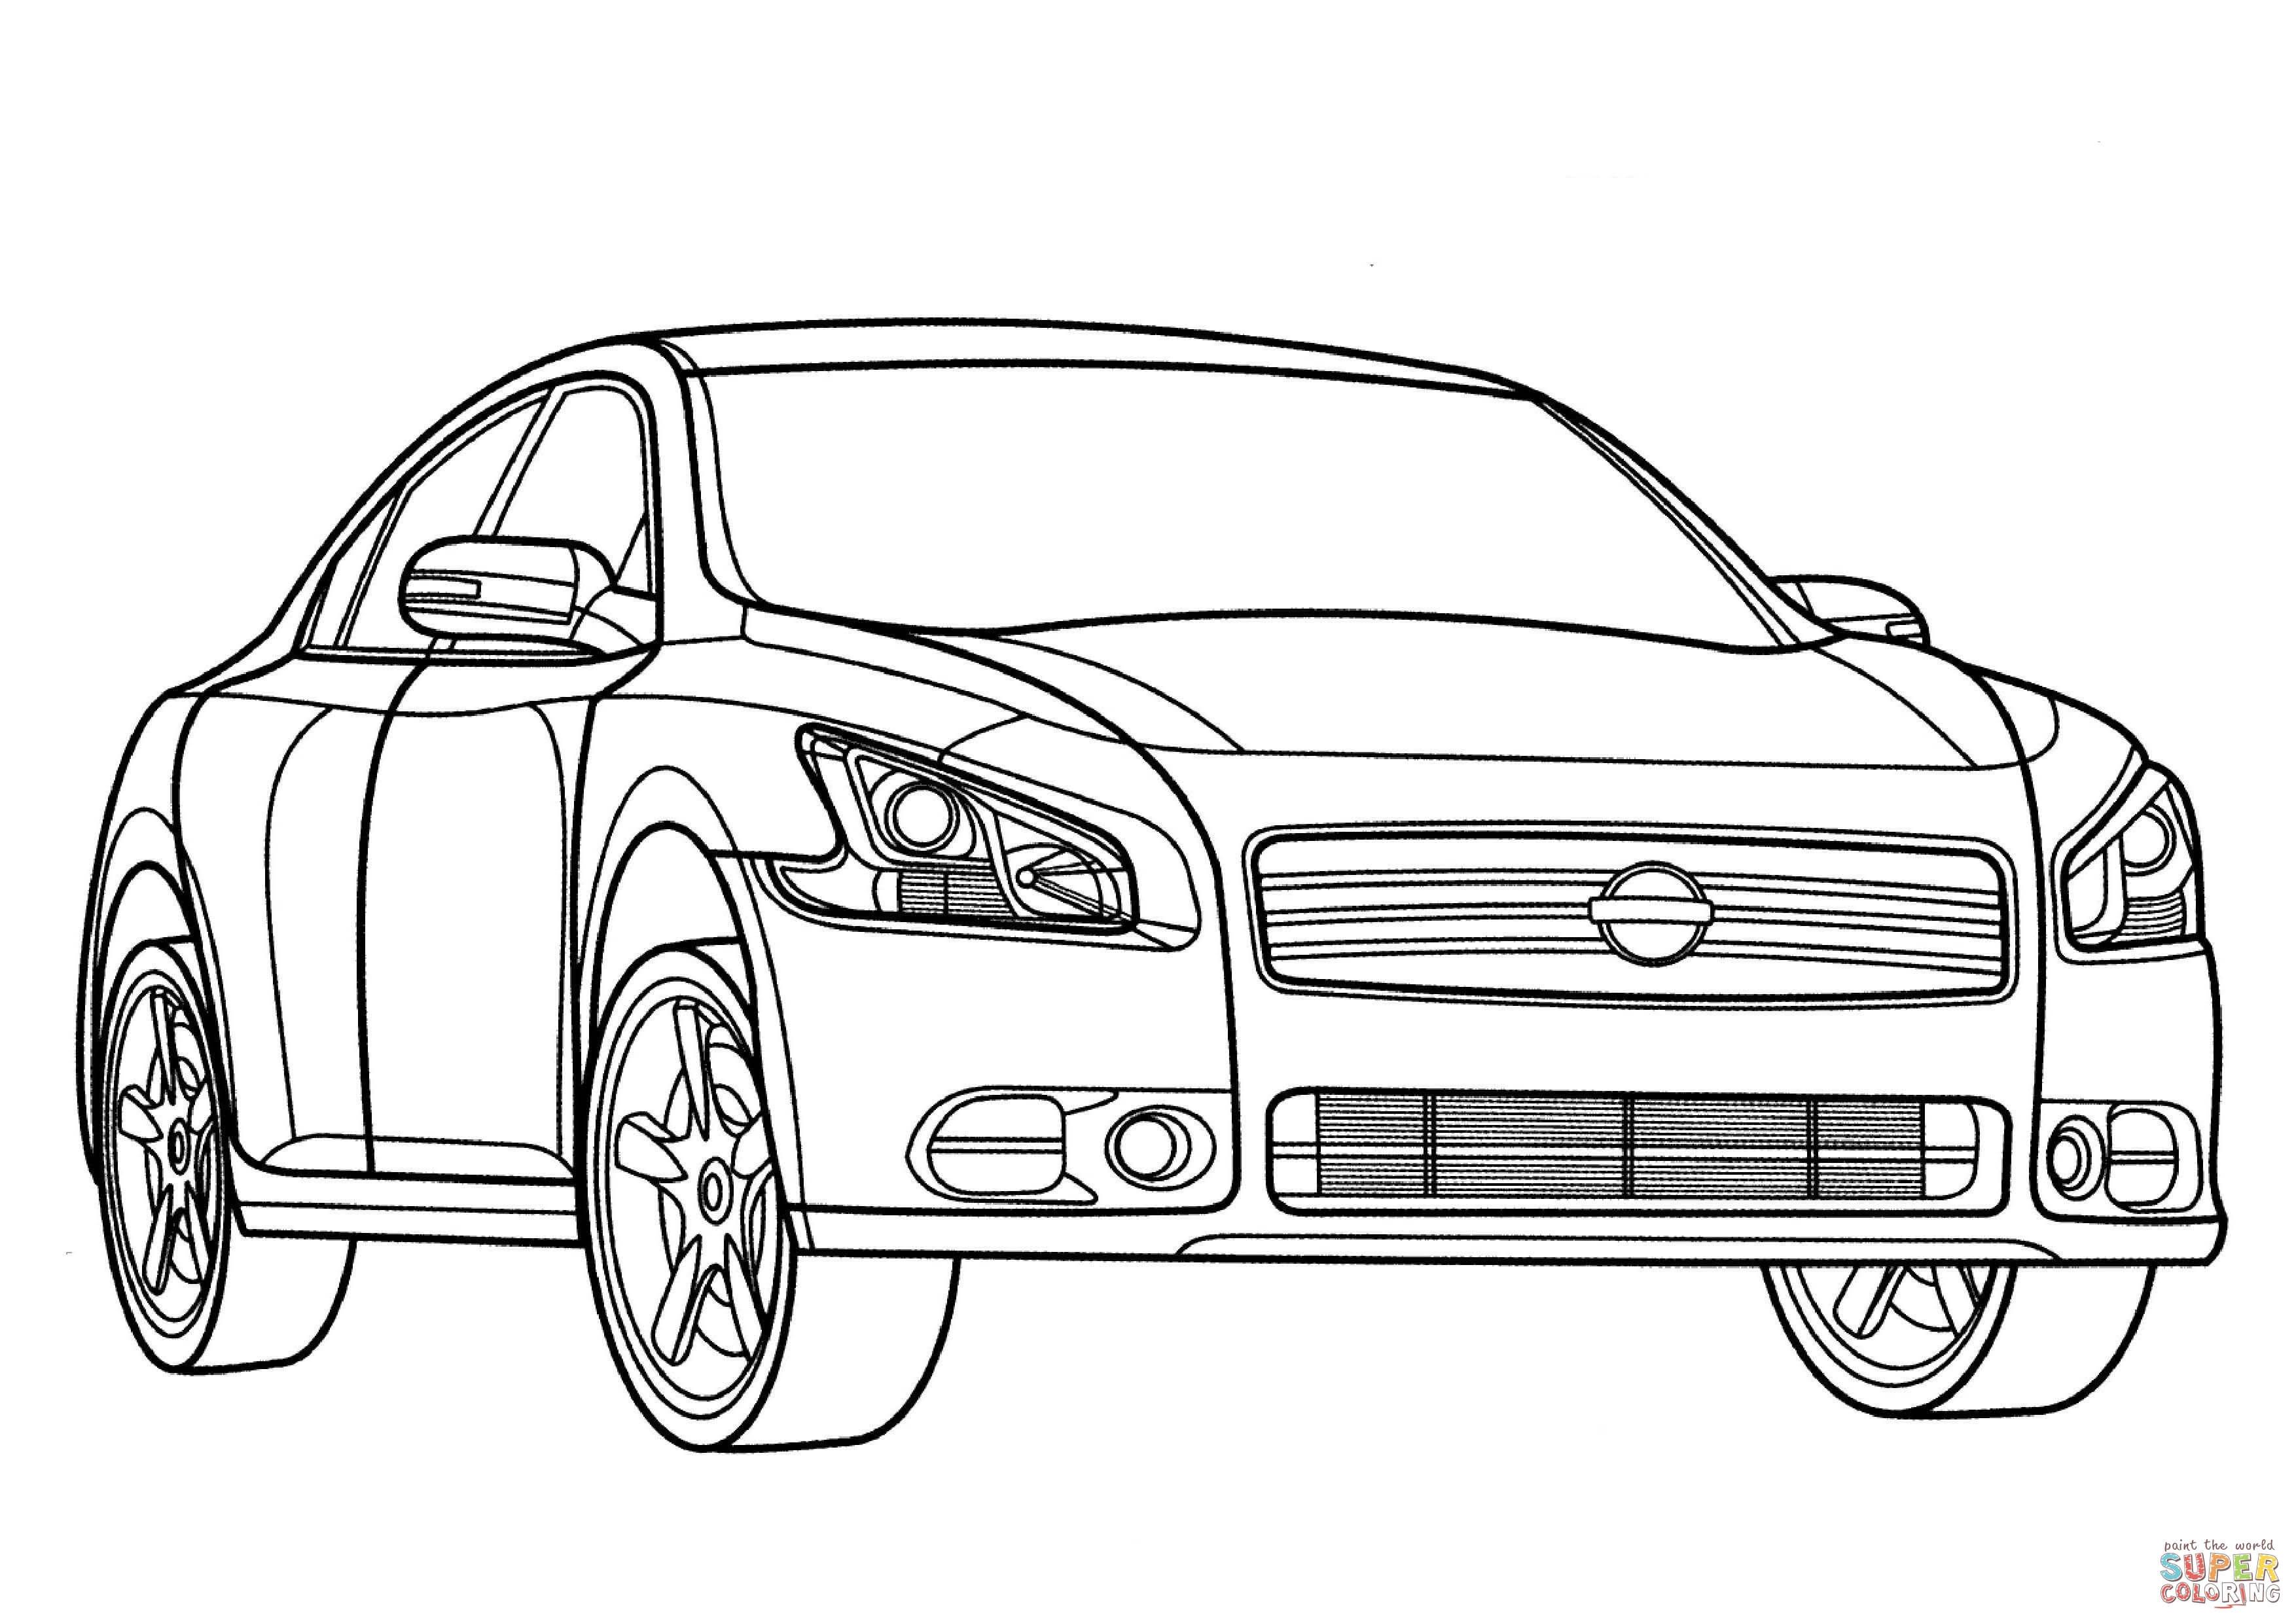 Dibujo De Nissan Maxima Para Colorear